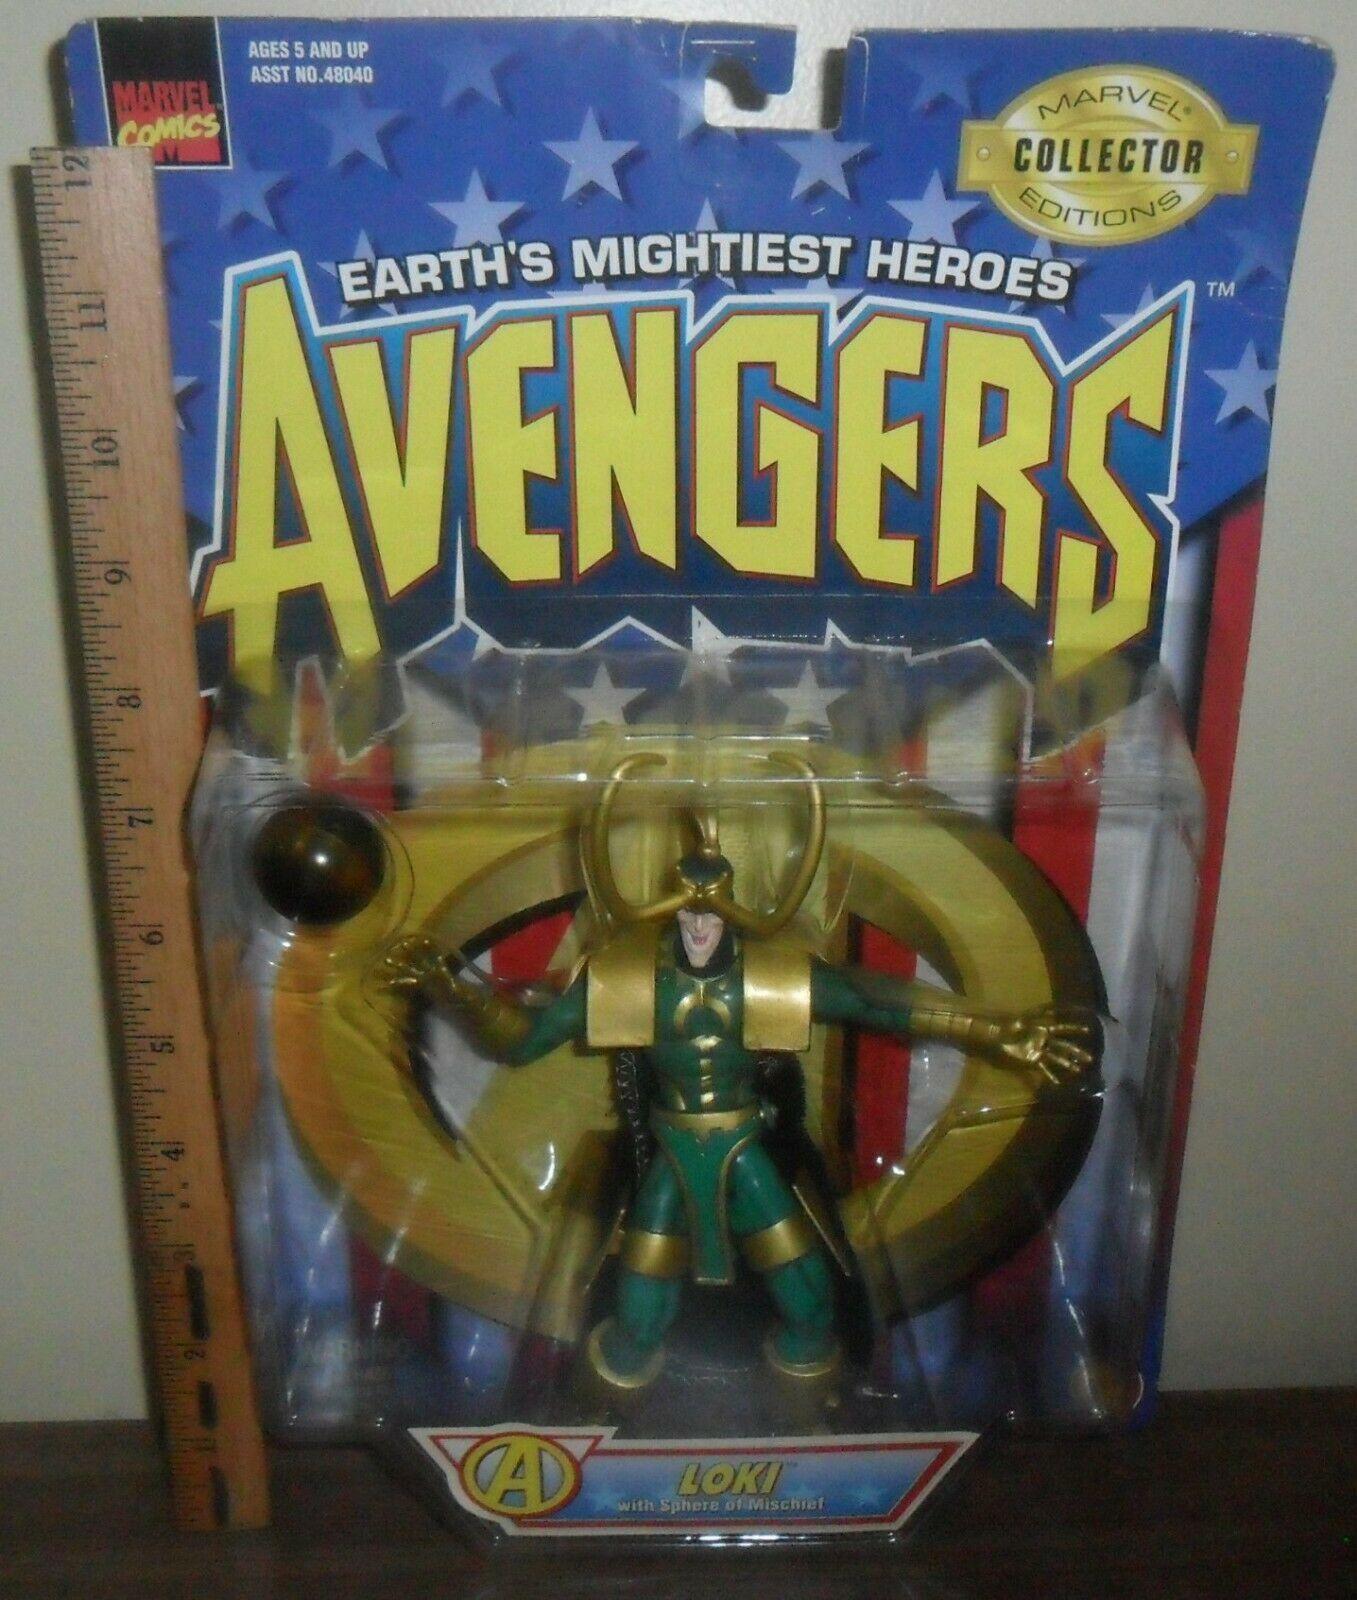 1997 Toy Biz Marvel Comics Avengers Action Figure ~ Loki with Sphere of Mischief